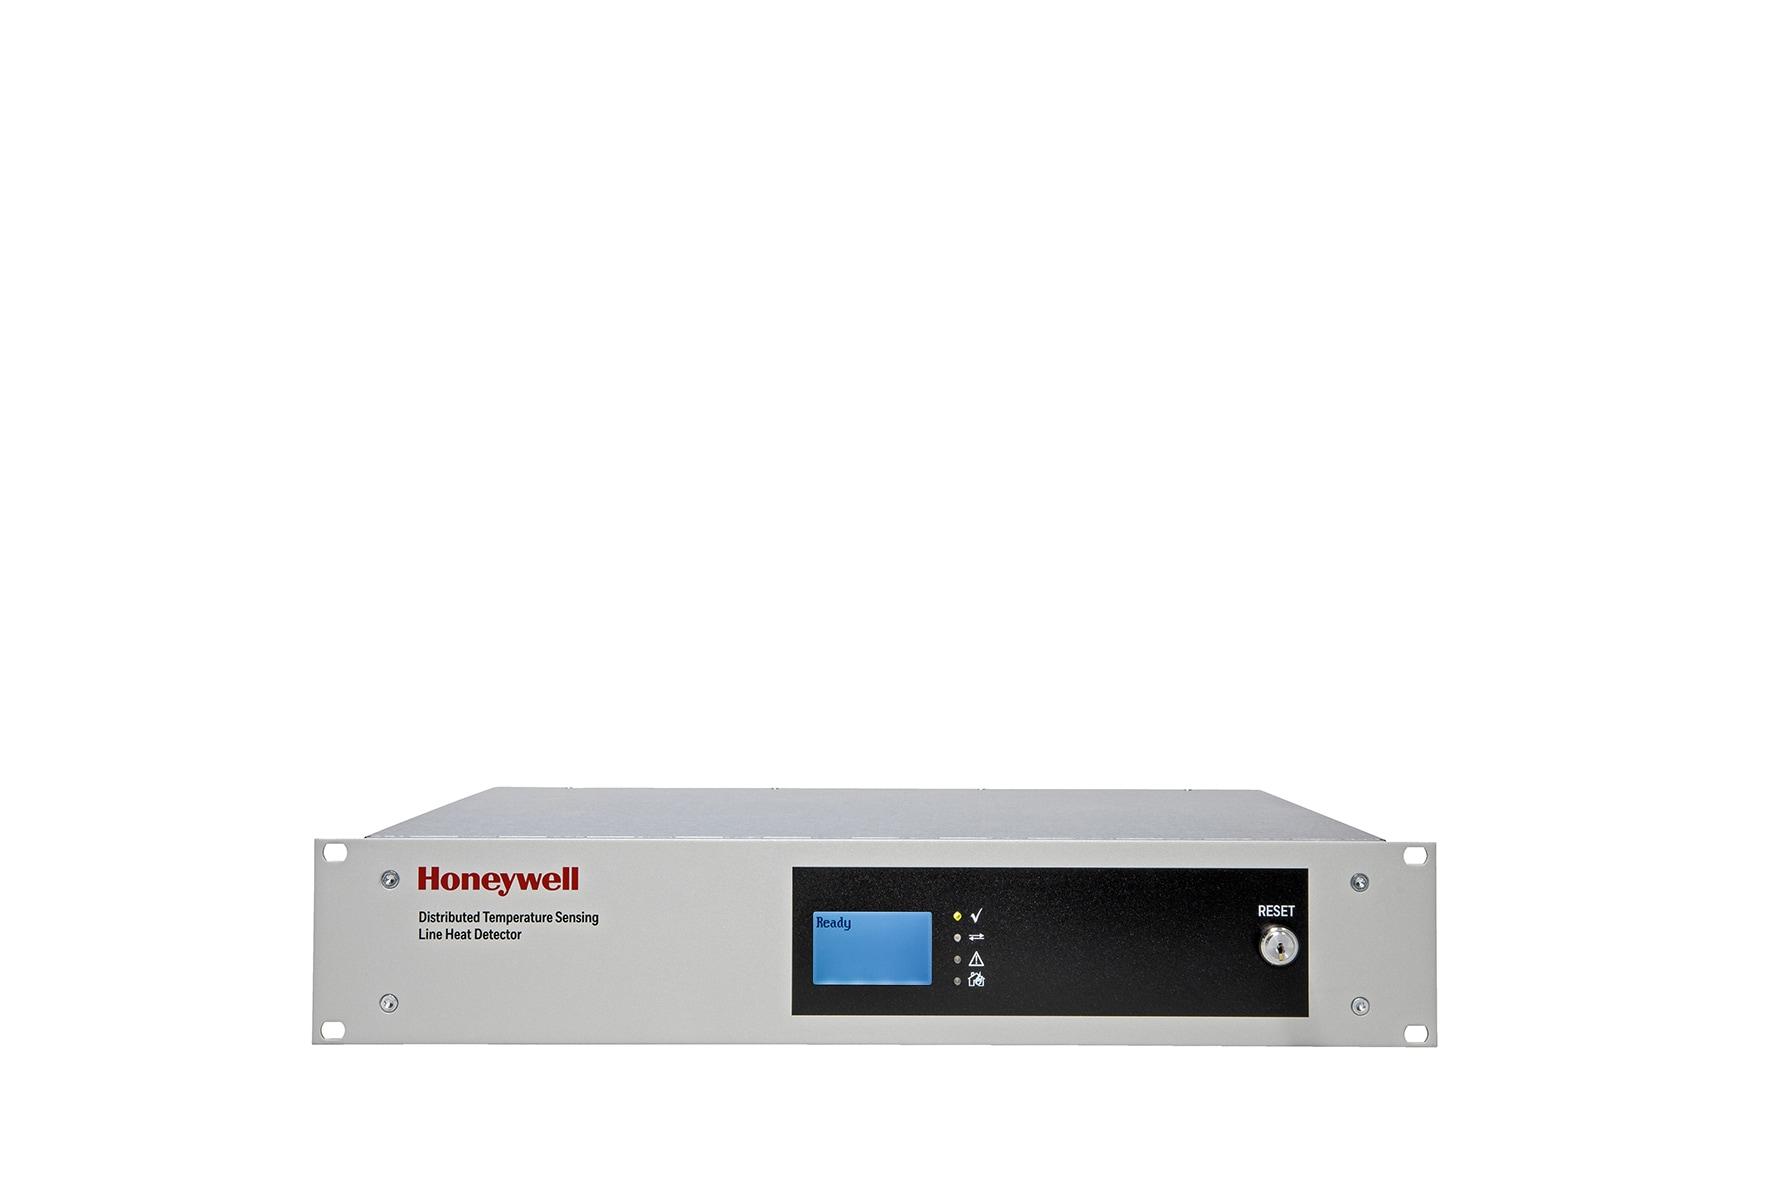 Line heat detector Honeywell DTS - evaluation unit, distance